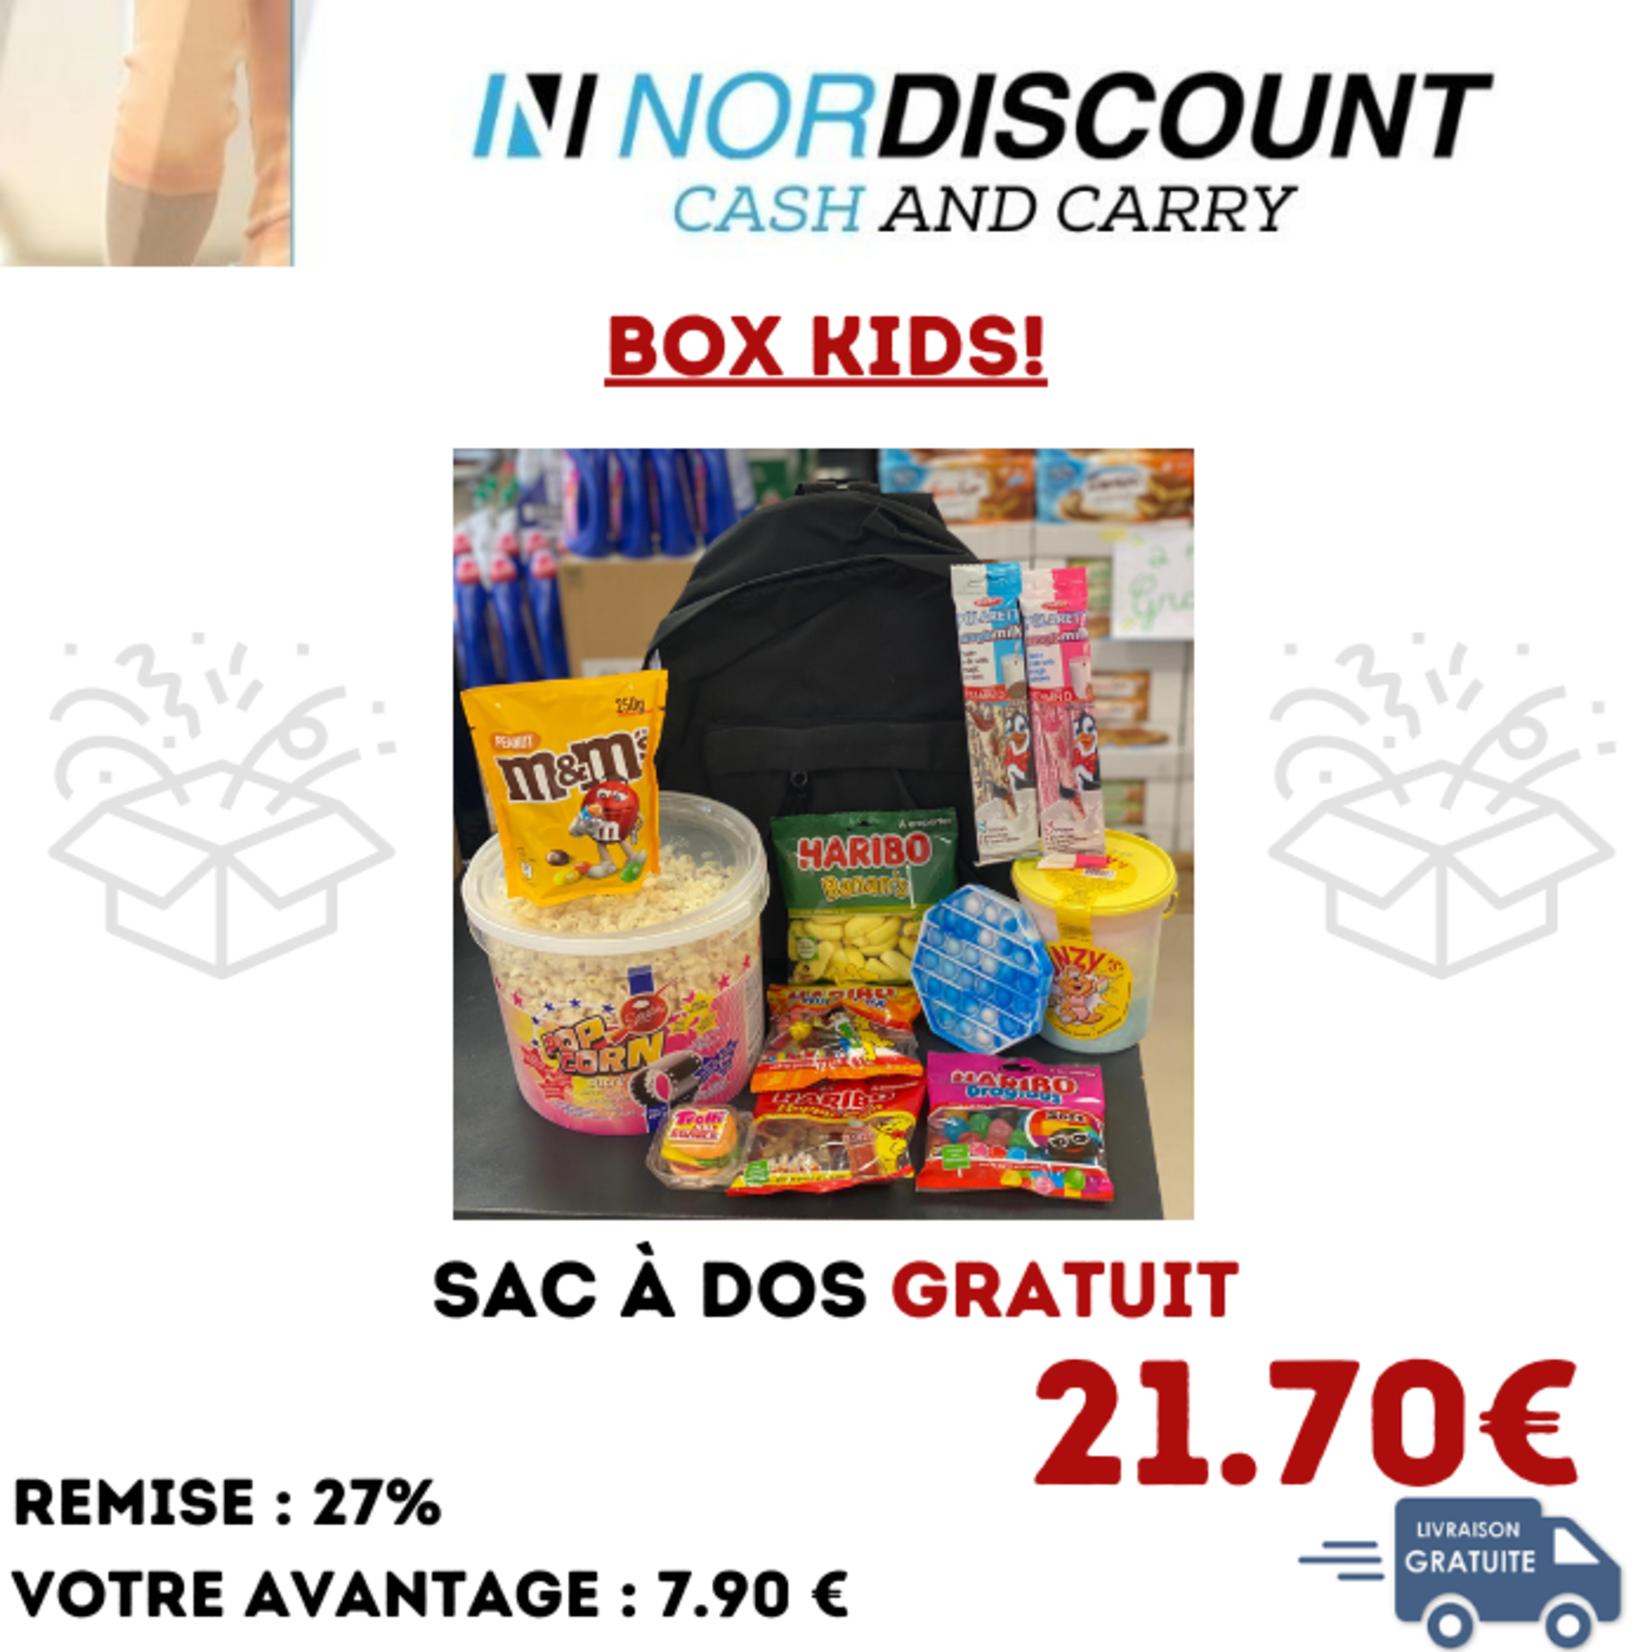 Box 18 Kids